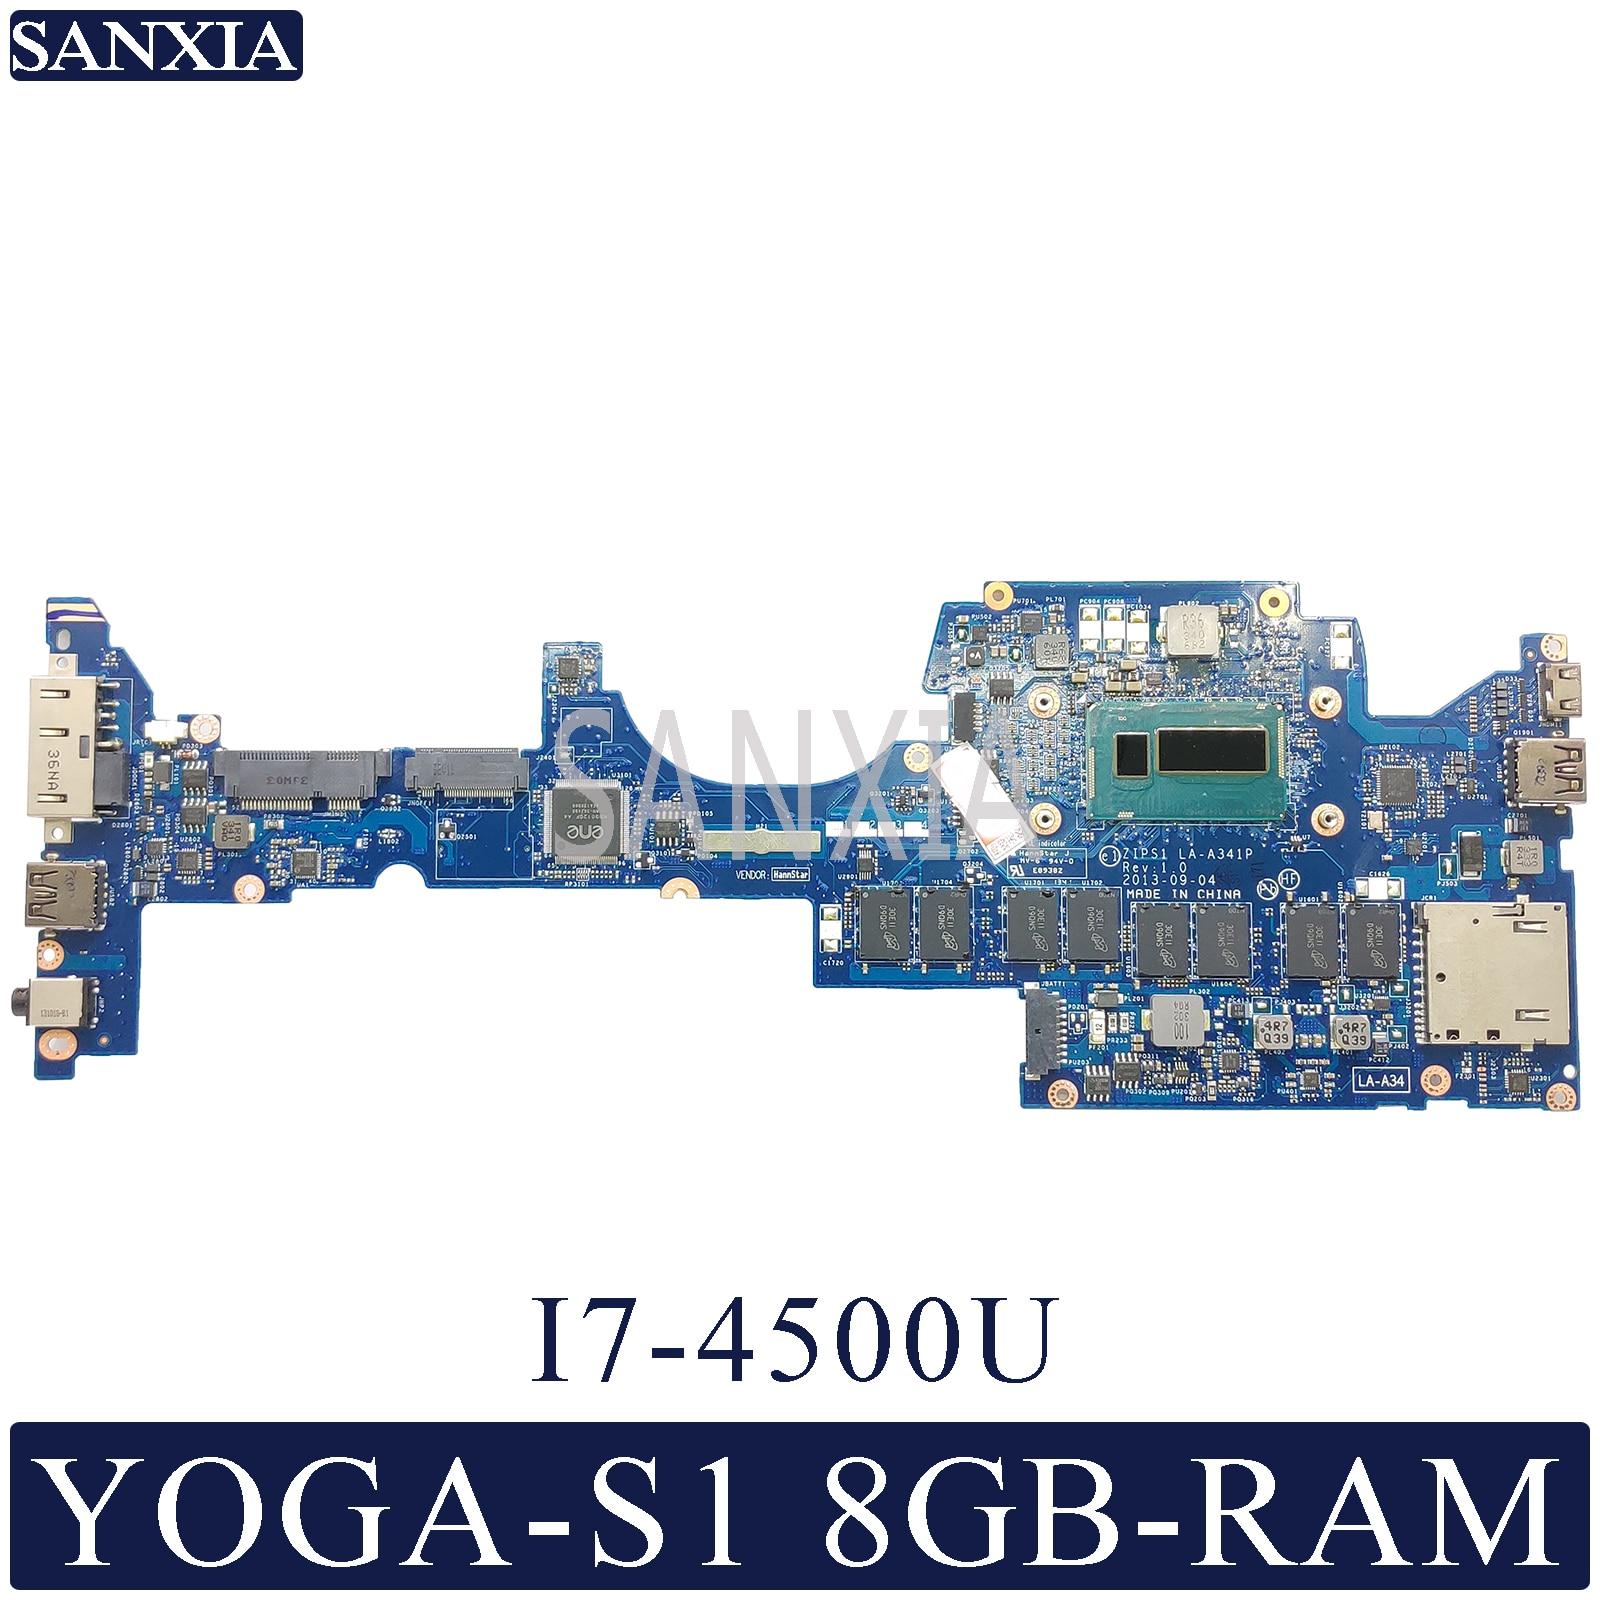 KEFU LA-A341P Laptop Motherboard For Lenovo ThinkPad YOGA S1 Original Mainboard 8GB-RAM I7-4500U